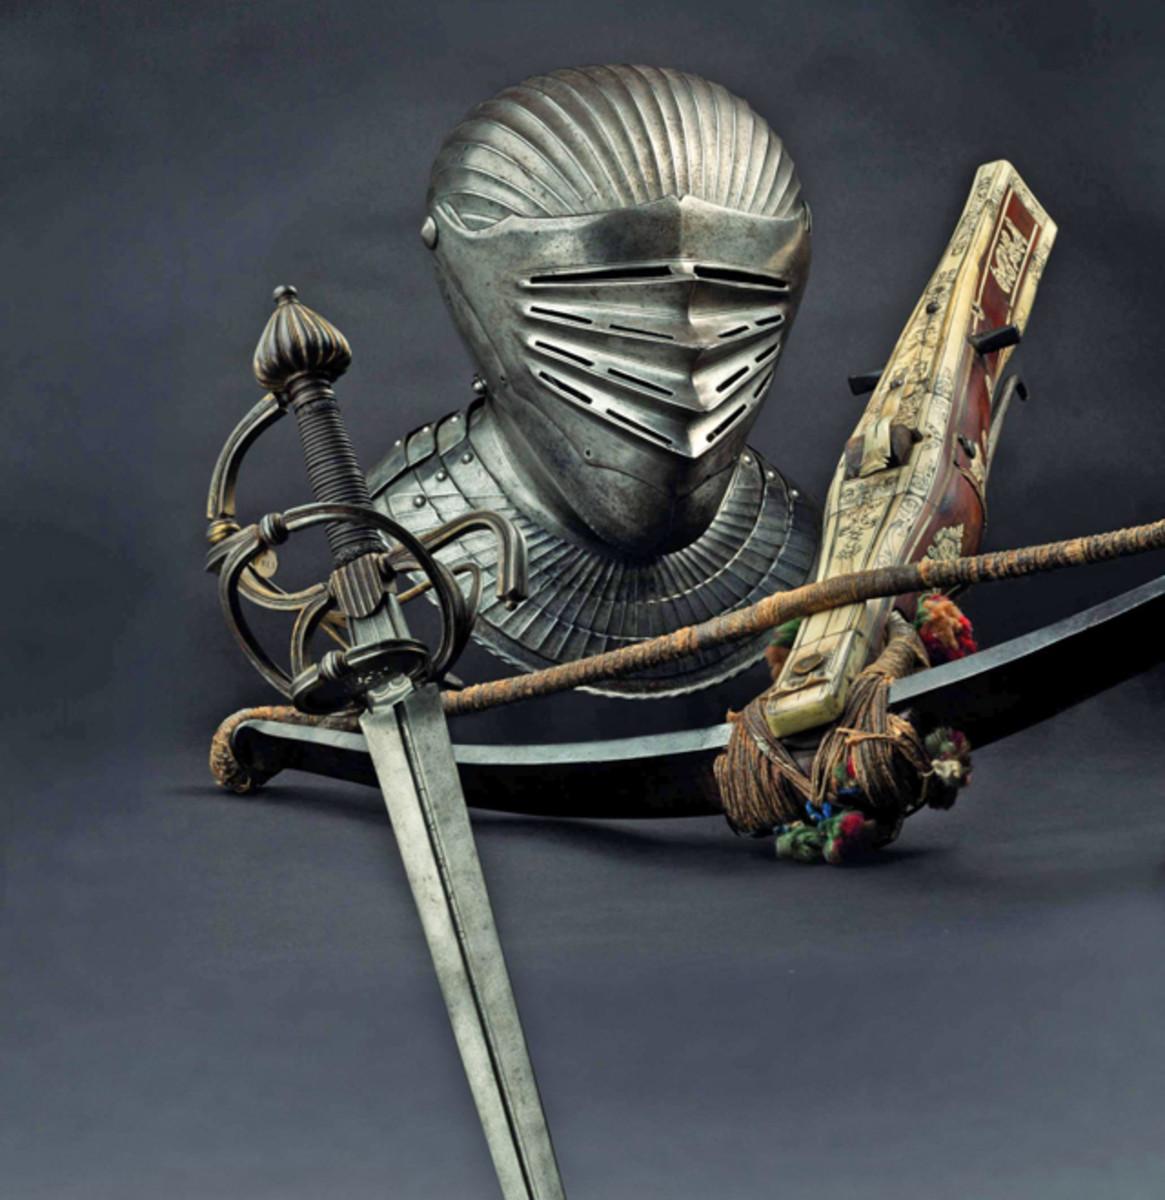 Saxon heavy sword, 1600, Maximilian style helmet + A German crossbow, 1600. SP: 14000 + 30000 + 12000 Euros